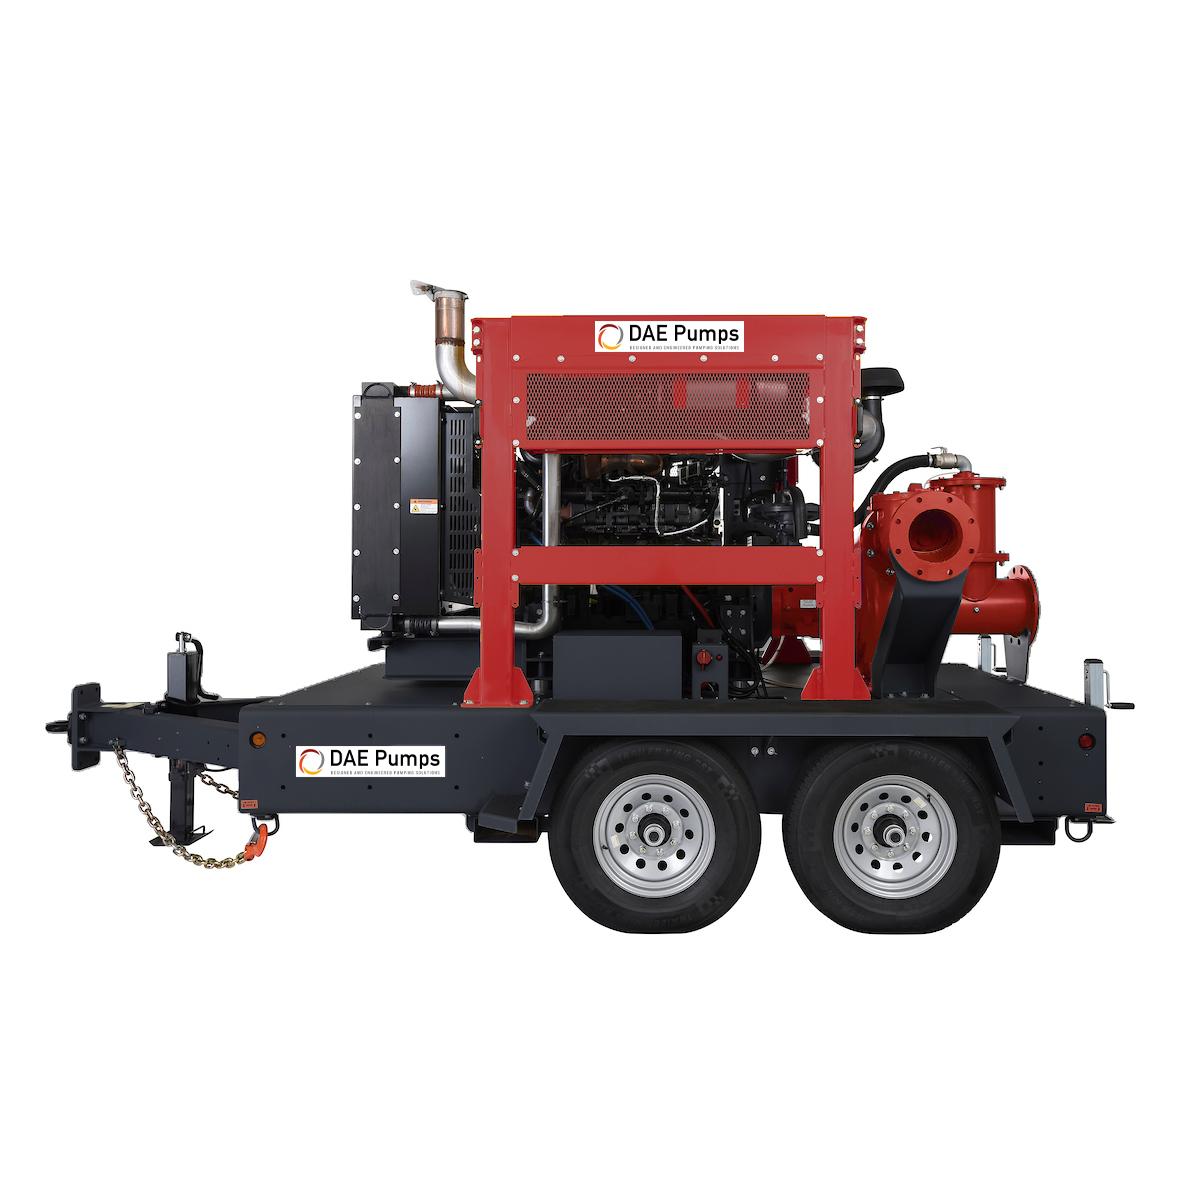 DAE Pumps Appalachian H1080 Self-Priming Pump with Trailer